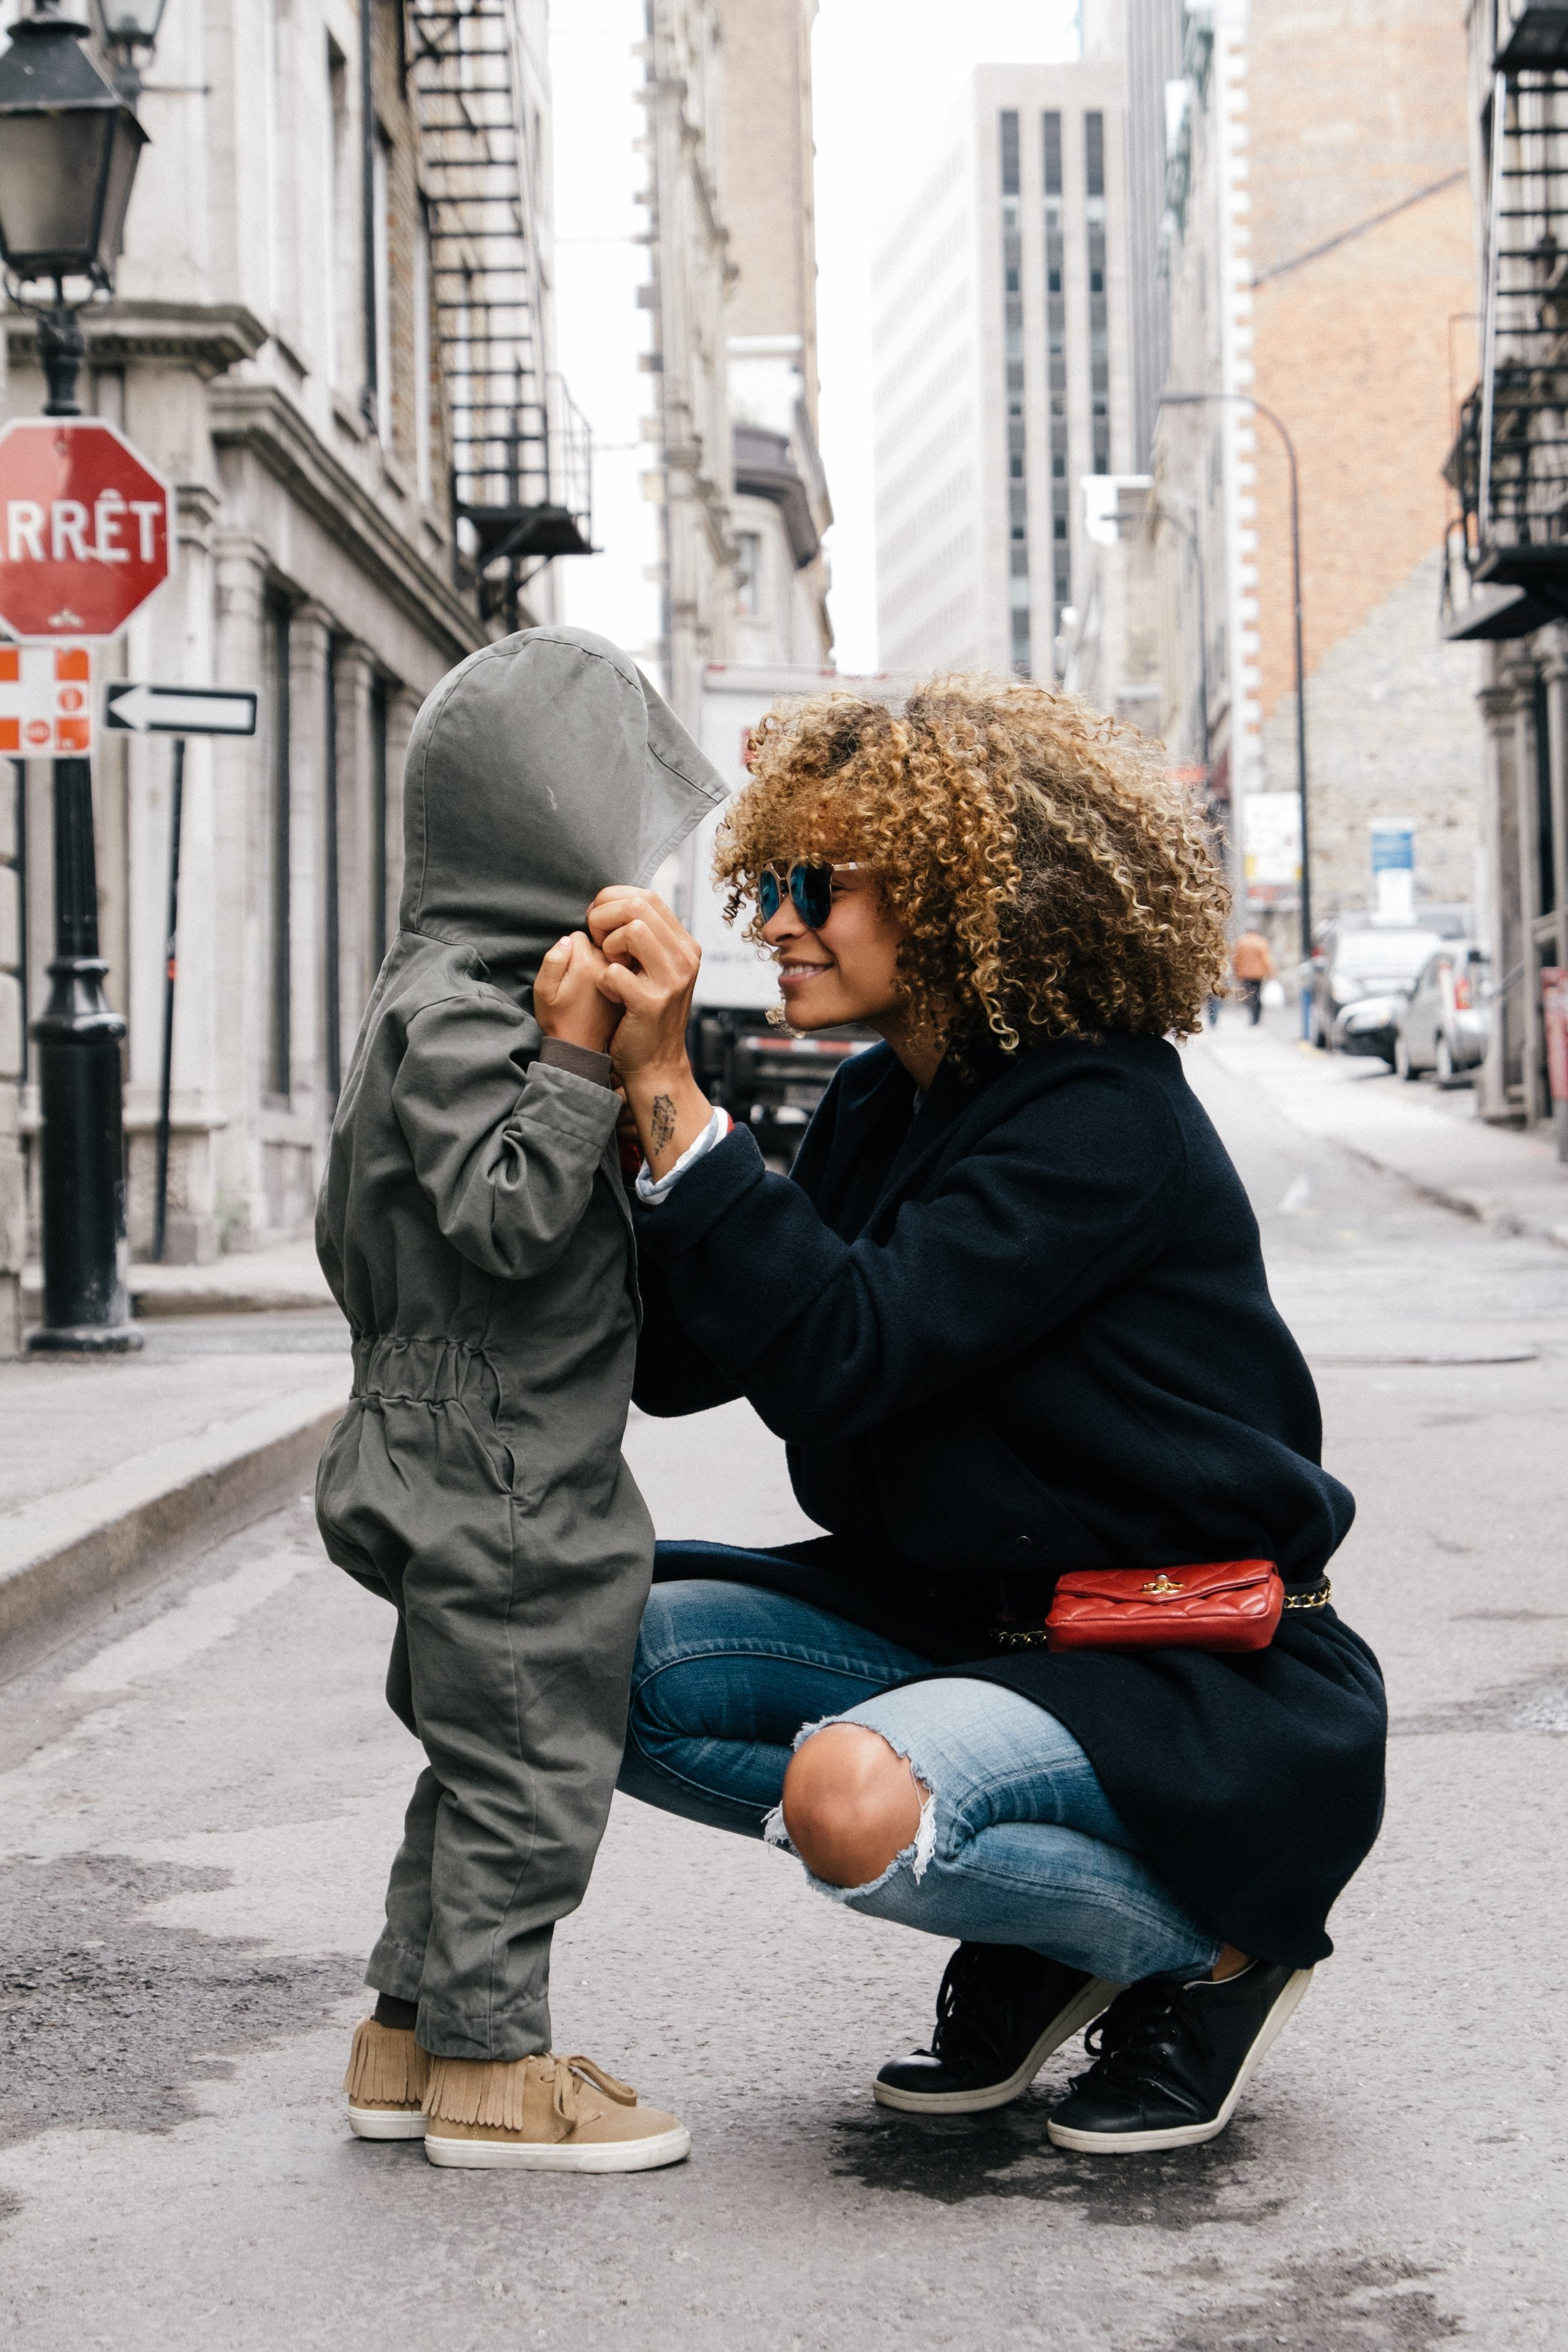 Parent Compass Program